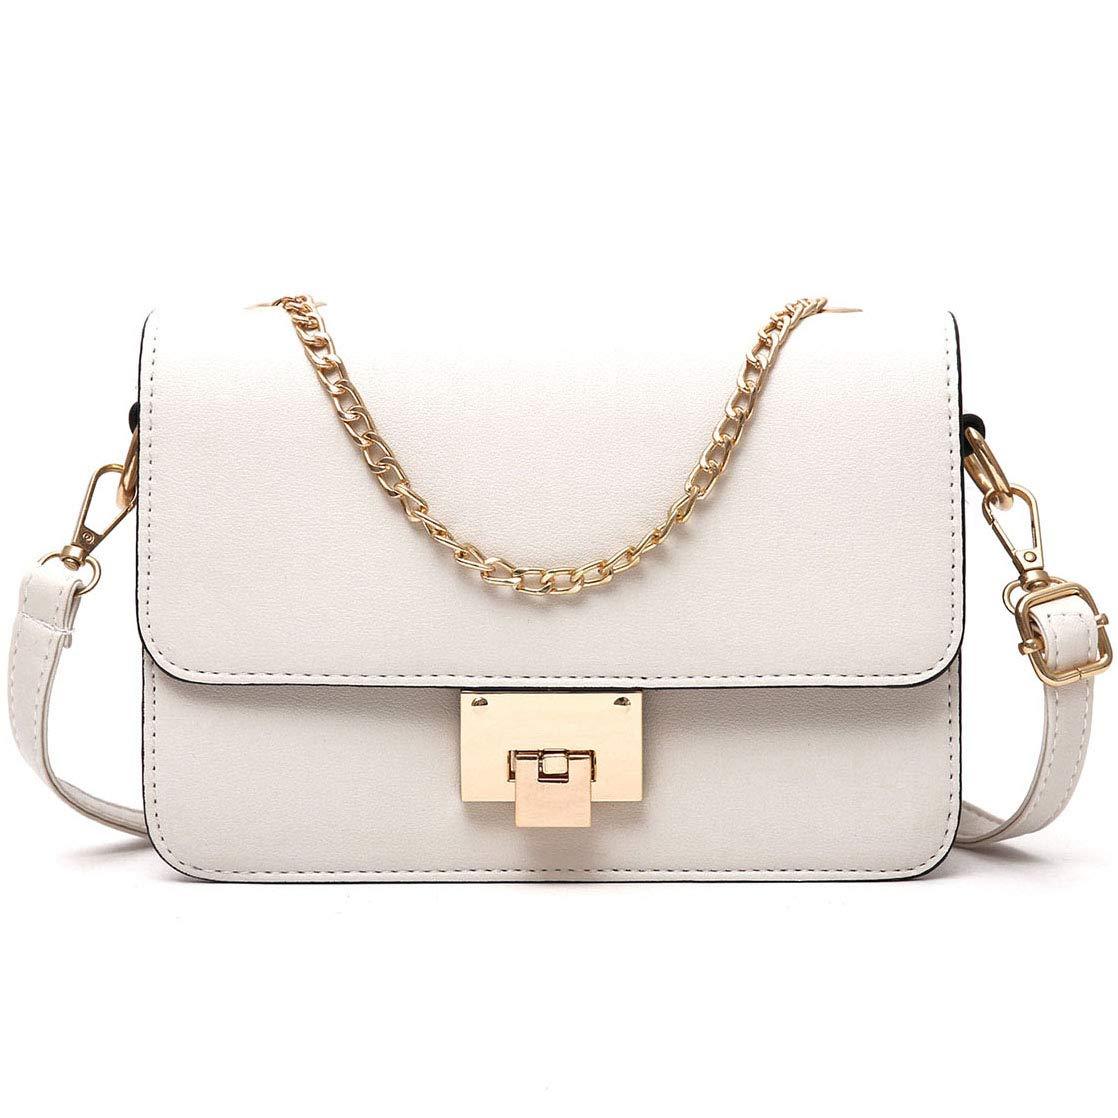 Ladies Designer Crossbody Bag Shoulder Bag for Women Small Purses Handbags